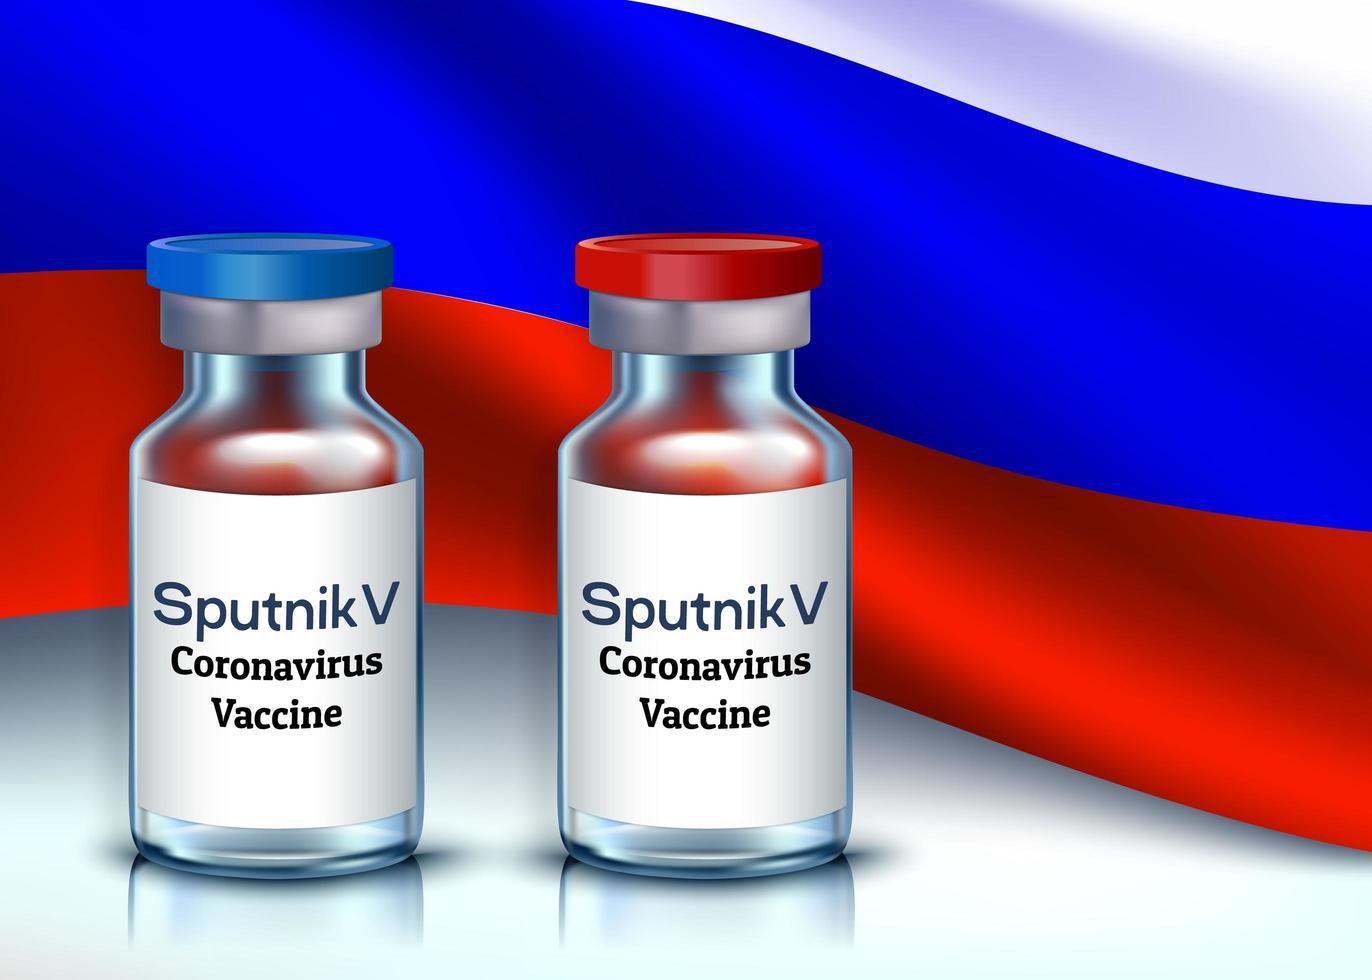 vacina contra coronavírus sputnik v vetor